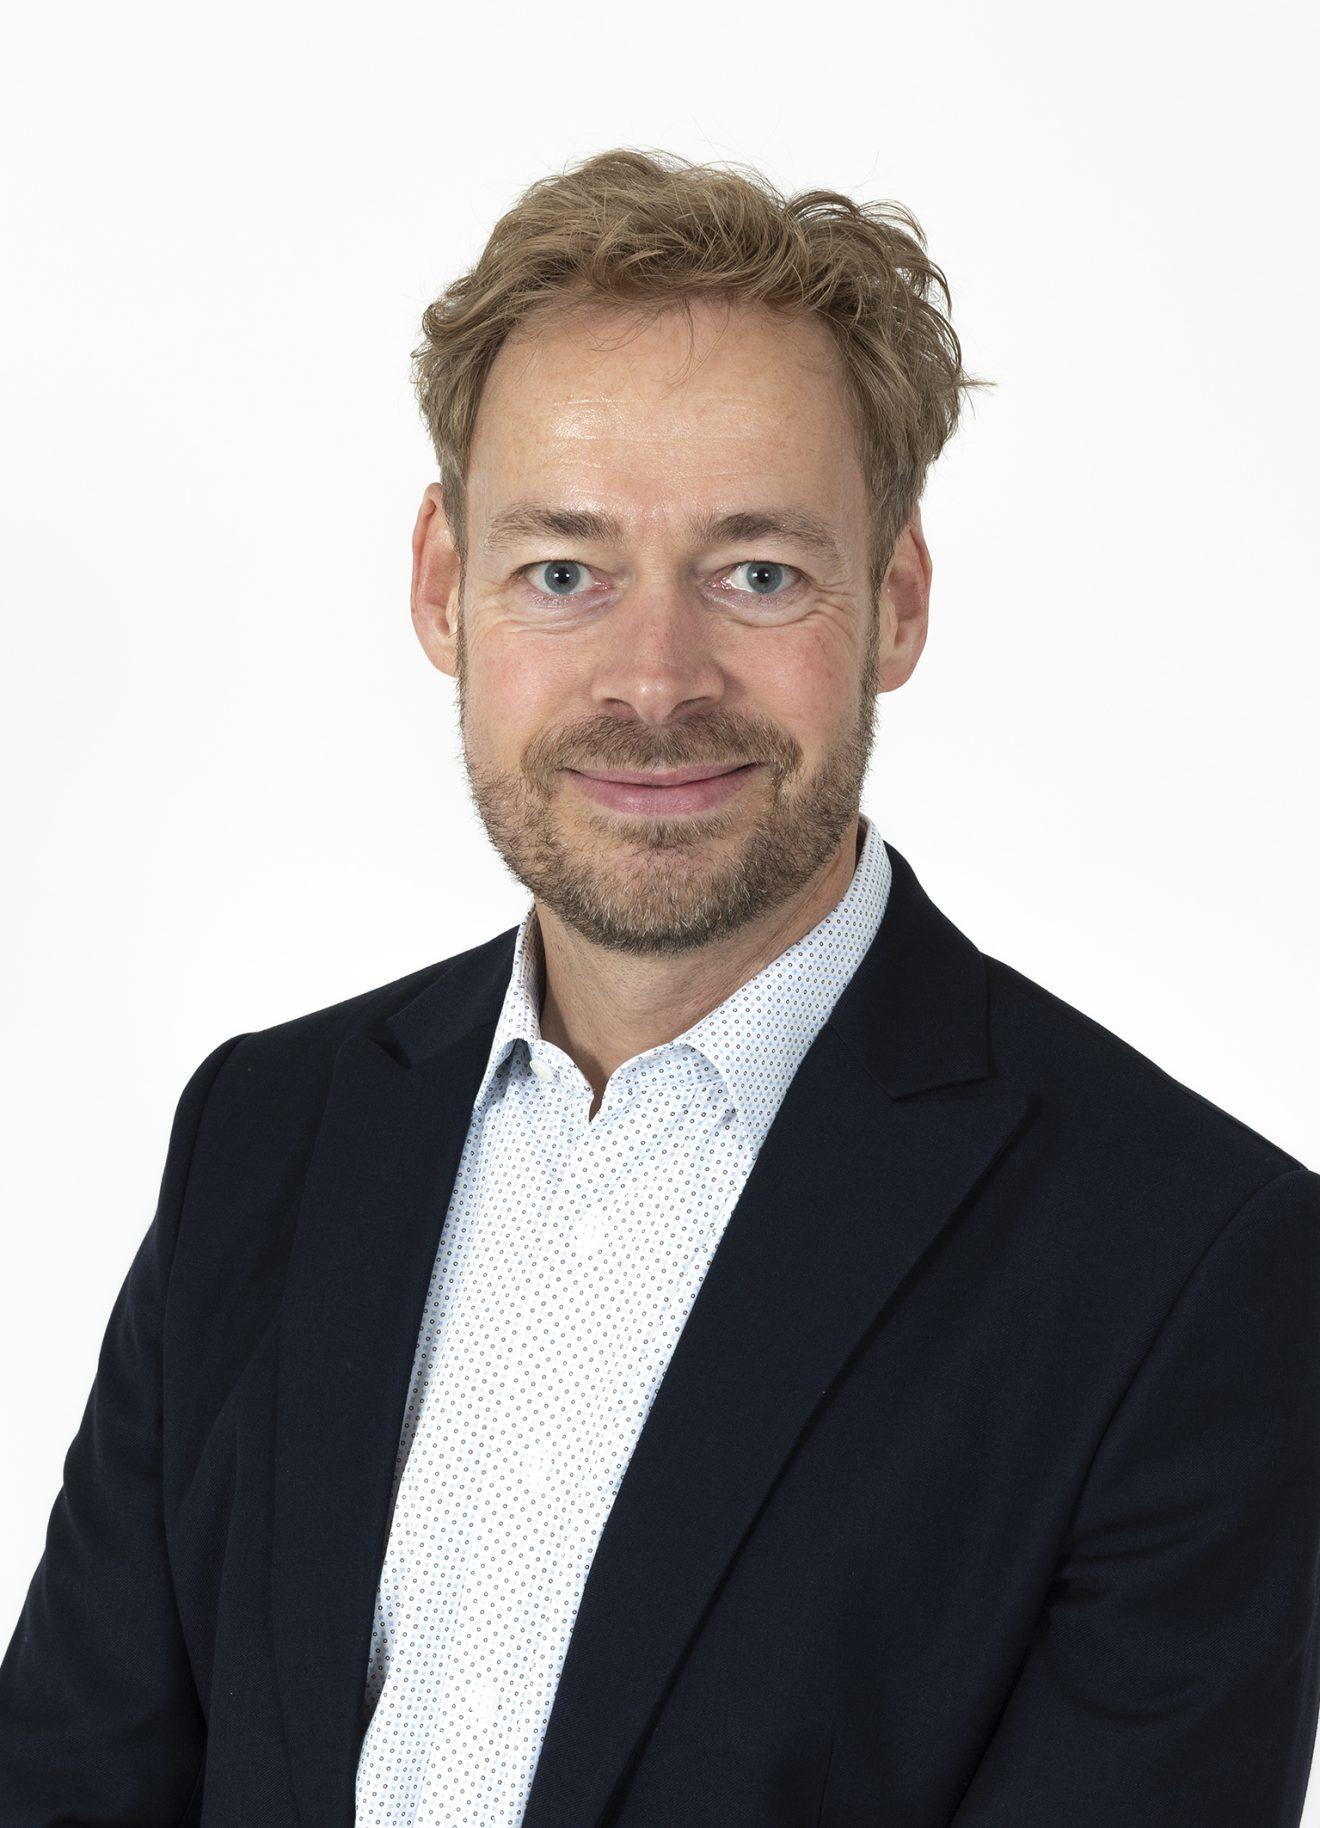 Ny vicekommunaldirektør i Sorø Kommune